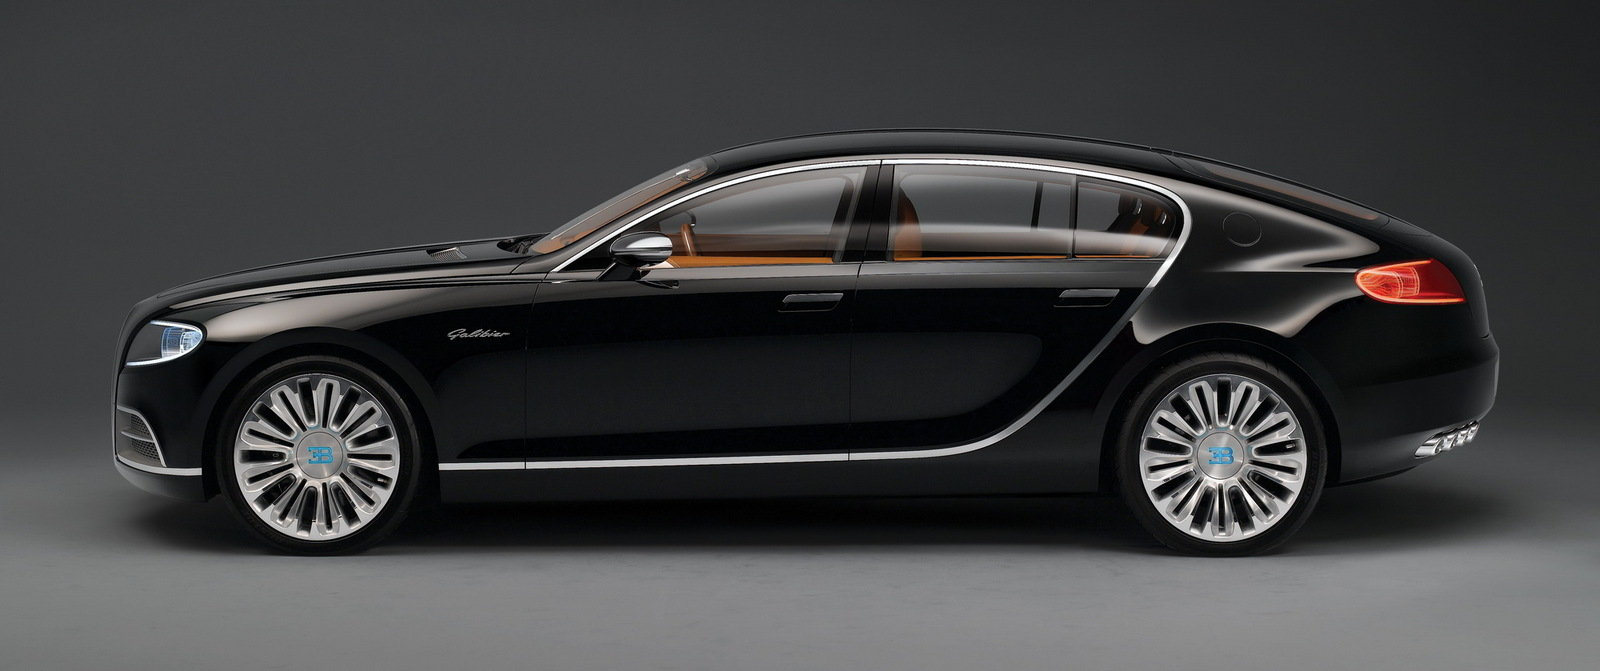 Audi A7 2018 Price >> 2020 Bugatti Galibier Price * Release date * Specs * Design